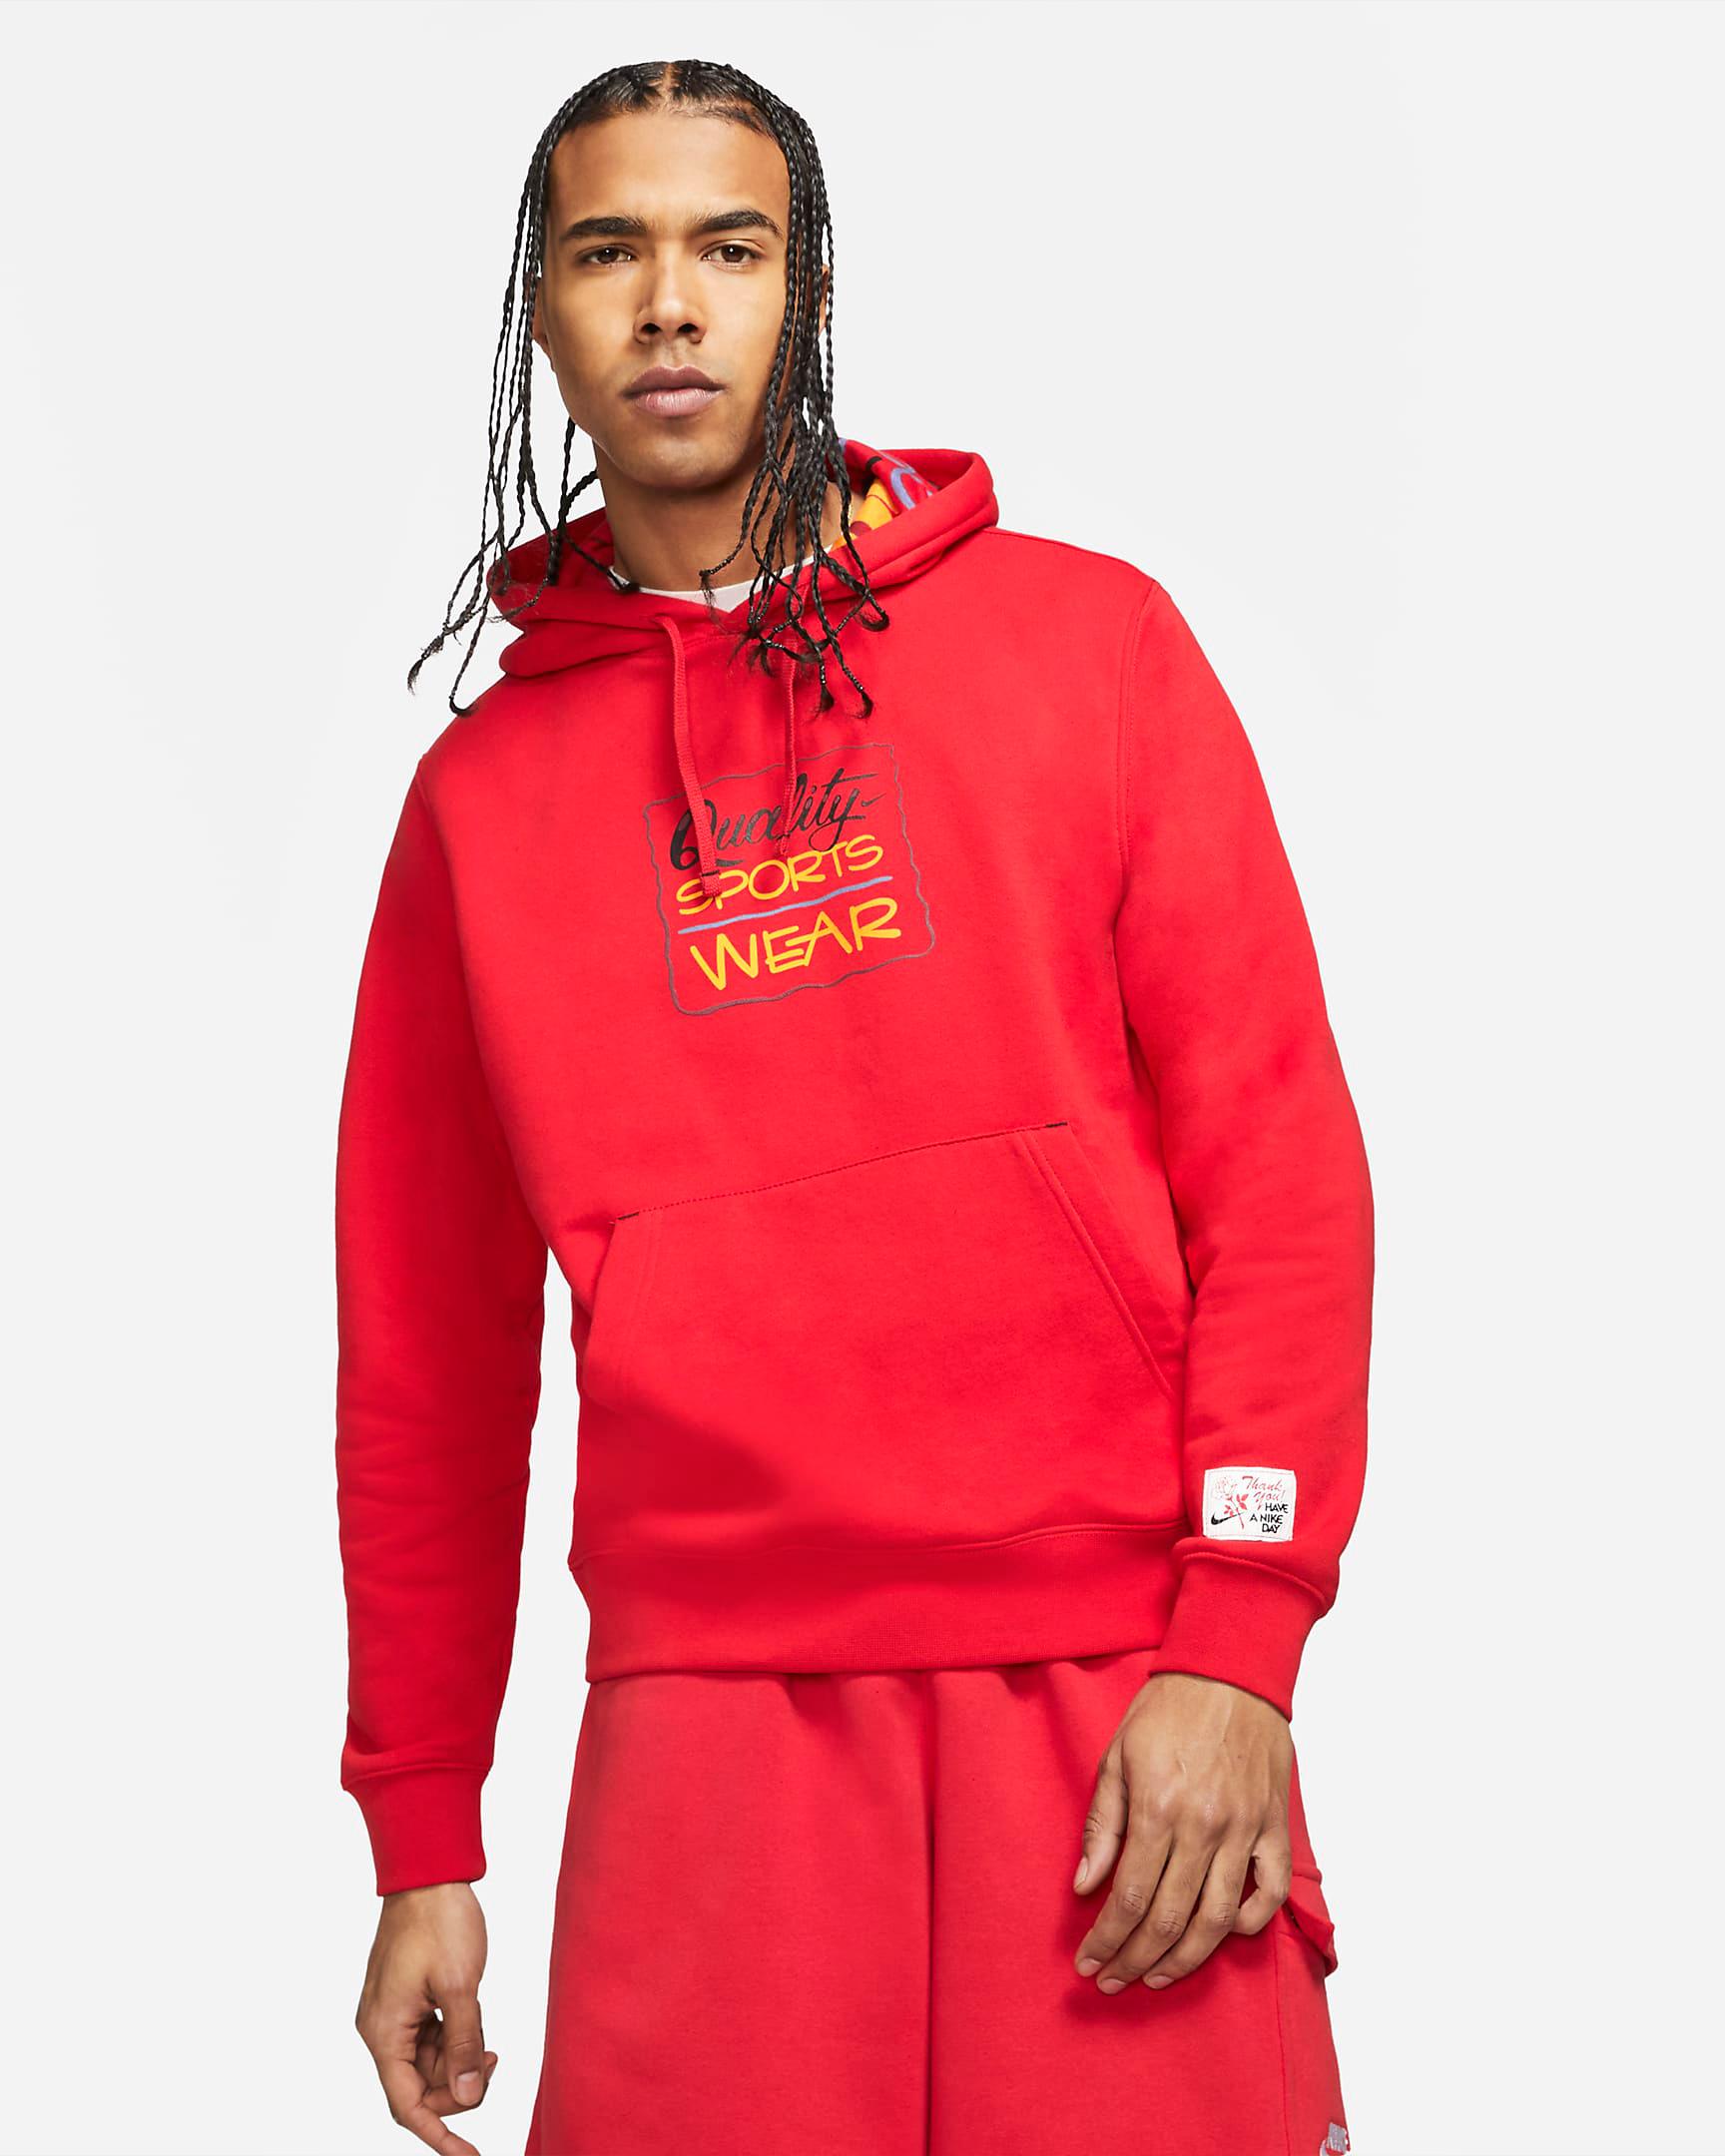 nike-bodega-red-hoodie-1